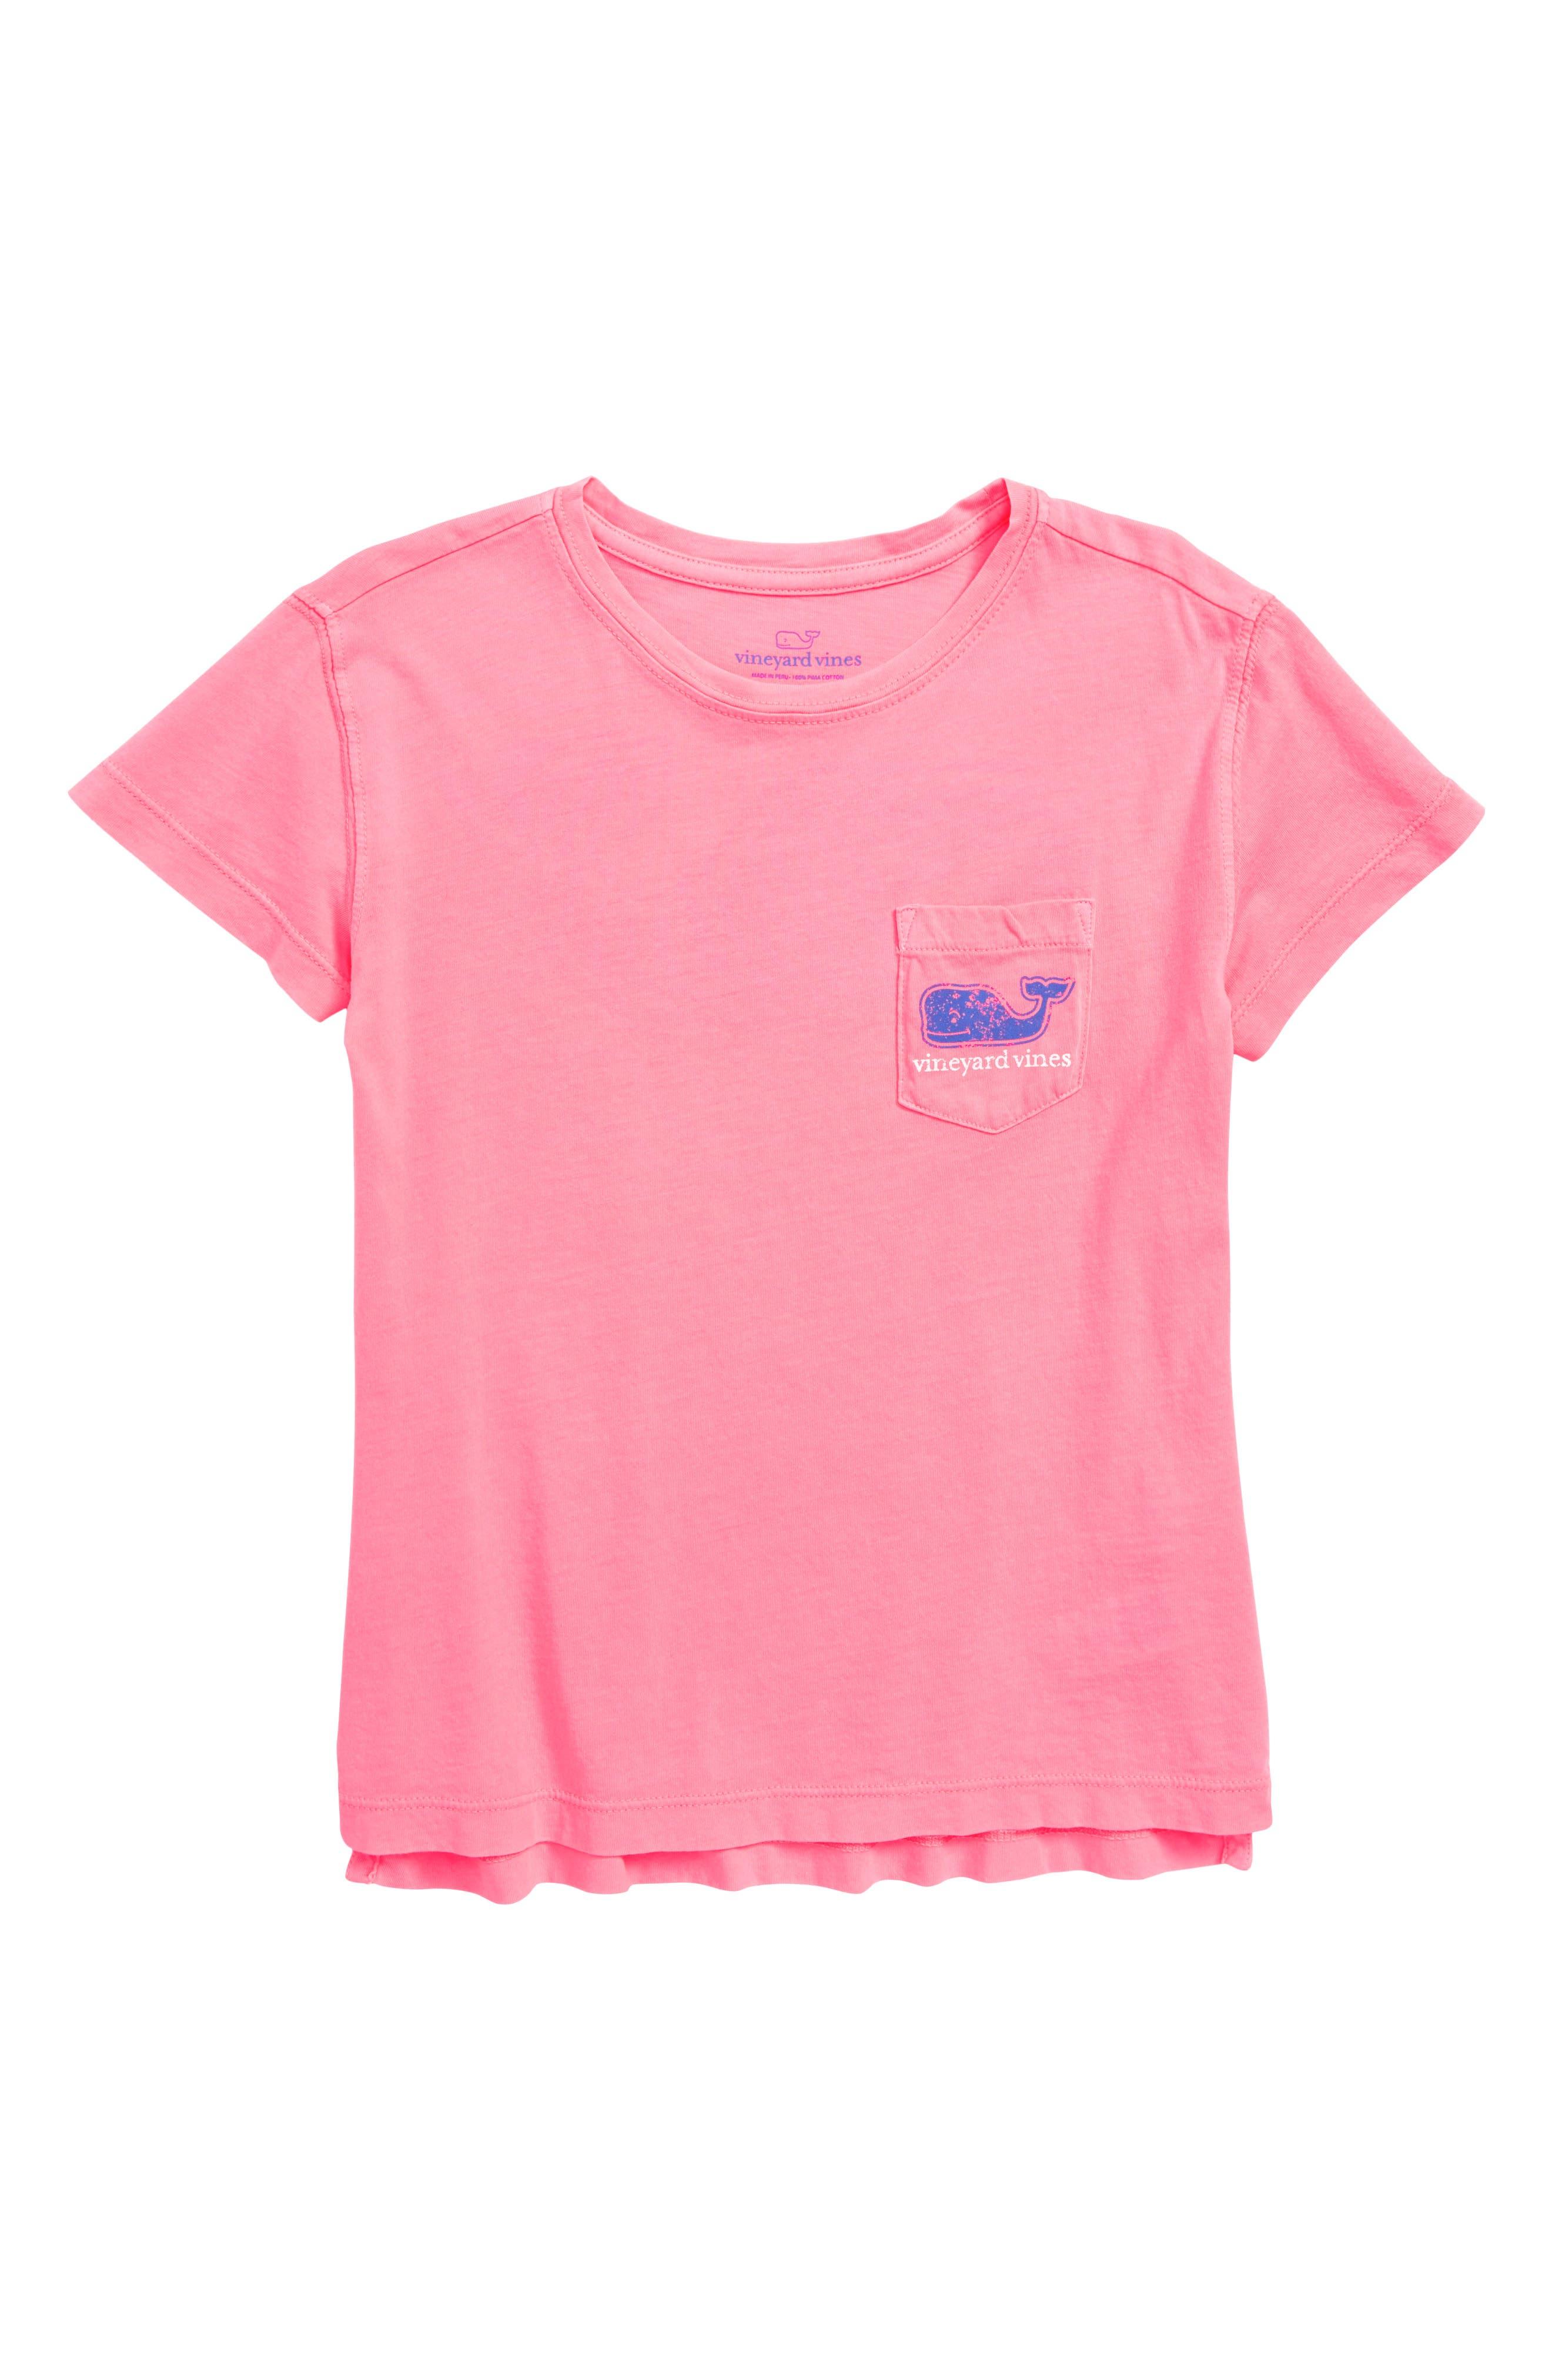 Vintage Whale Pocket Tee,                         Main,                         color, Malibu Pink